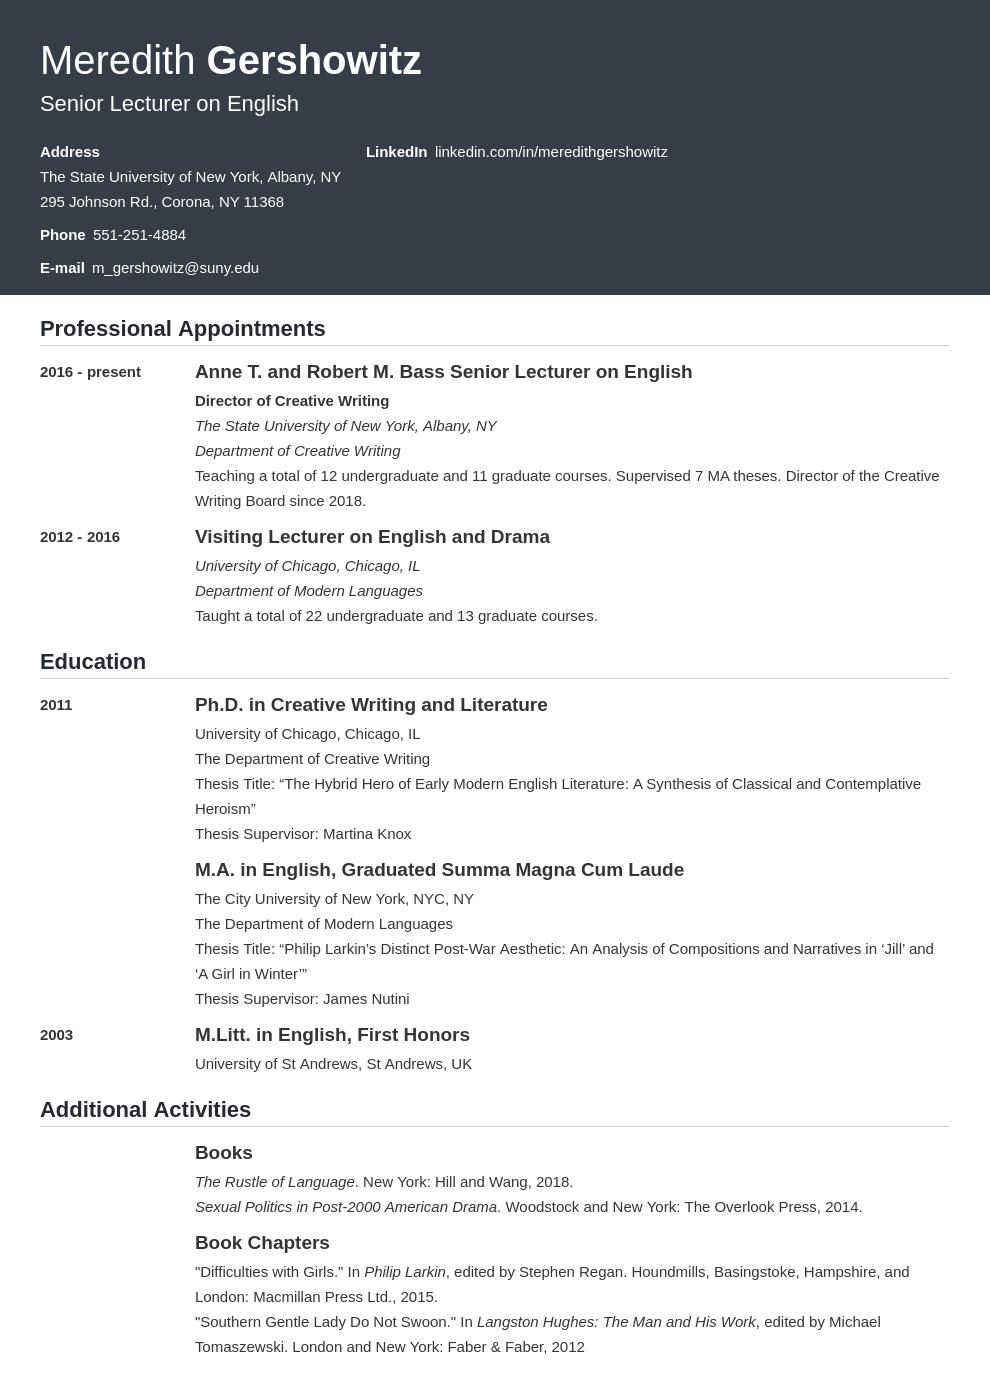 cv academic template influx uk